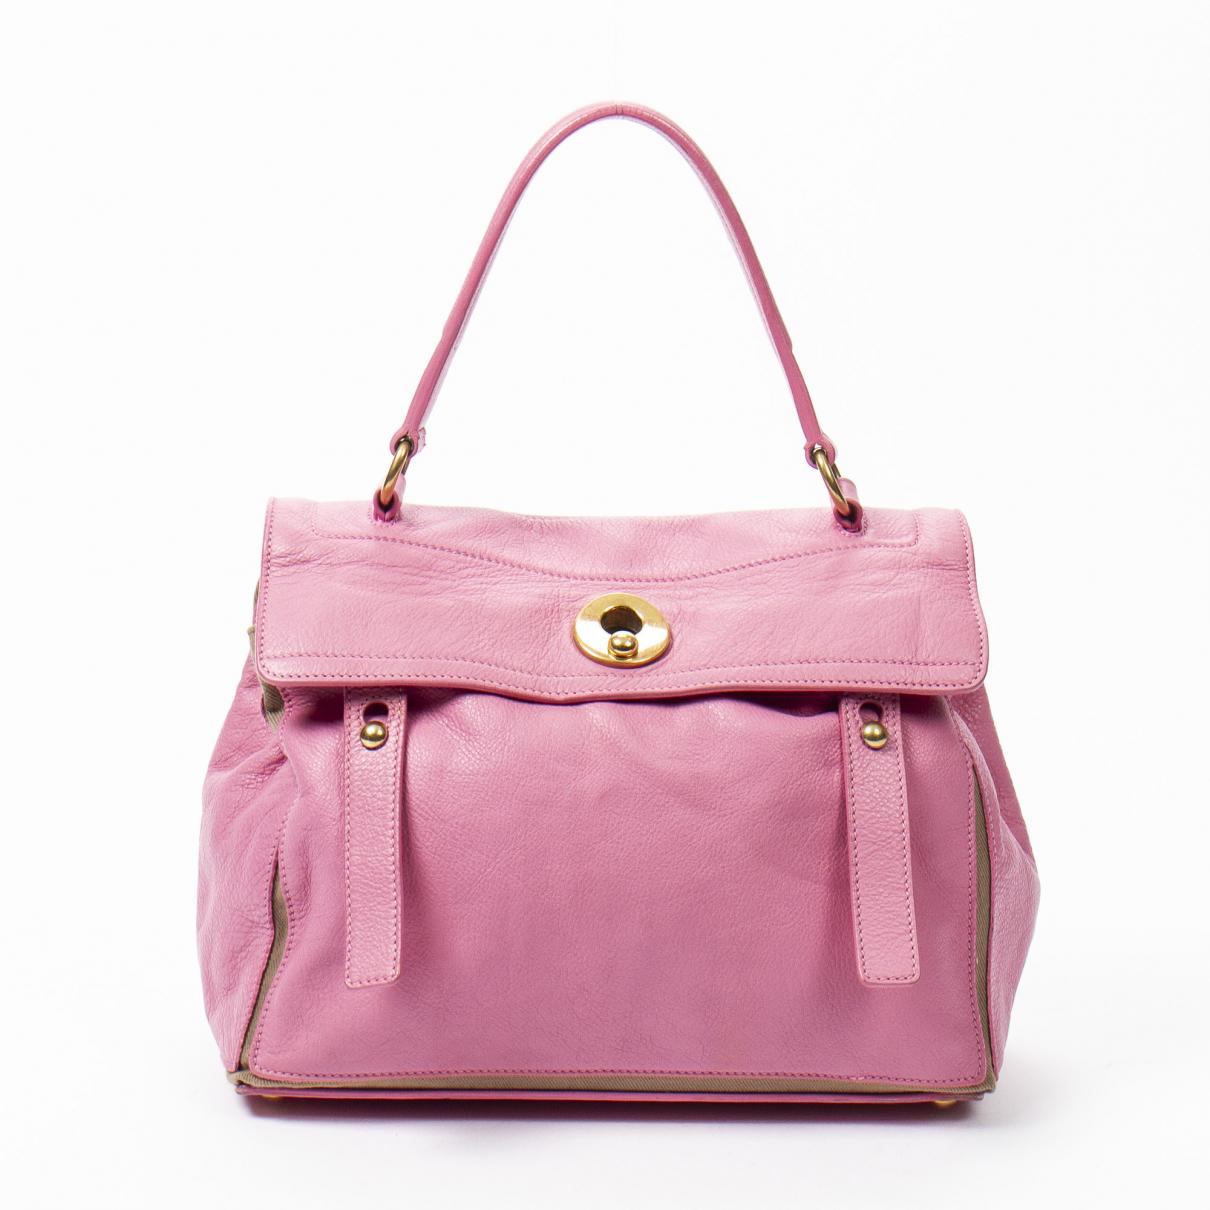 Yves Saint Laurent Muse Two Handtasche in  Rosa Leder